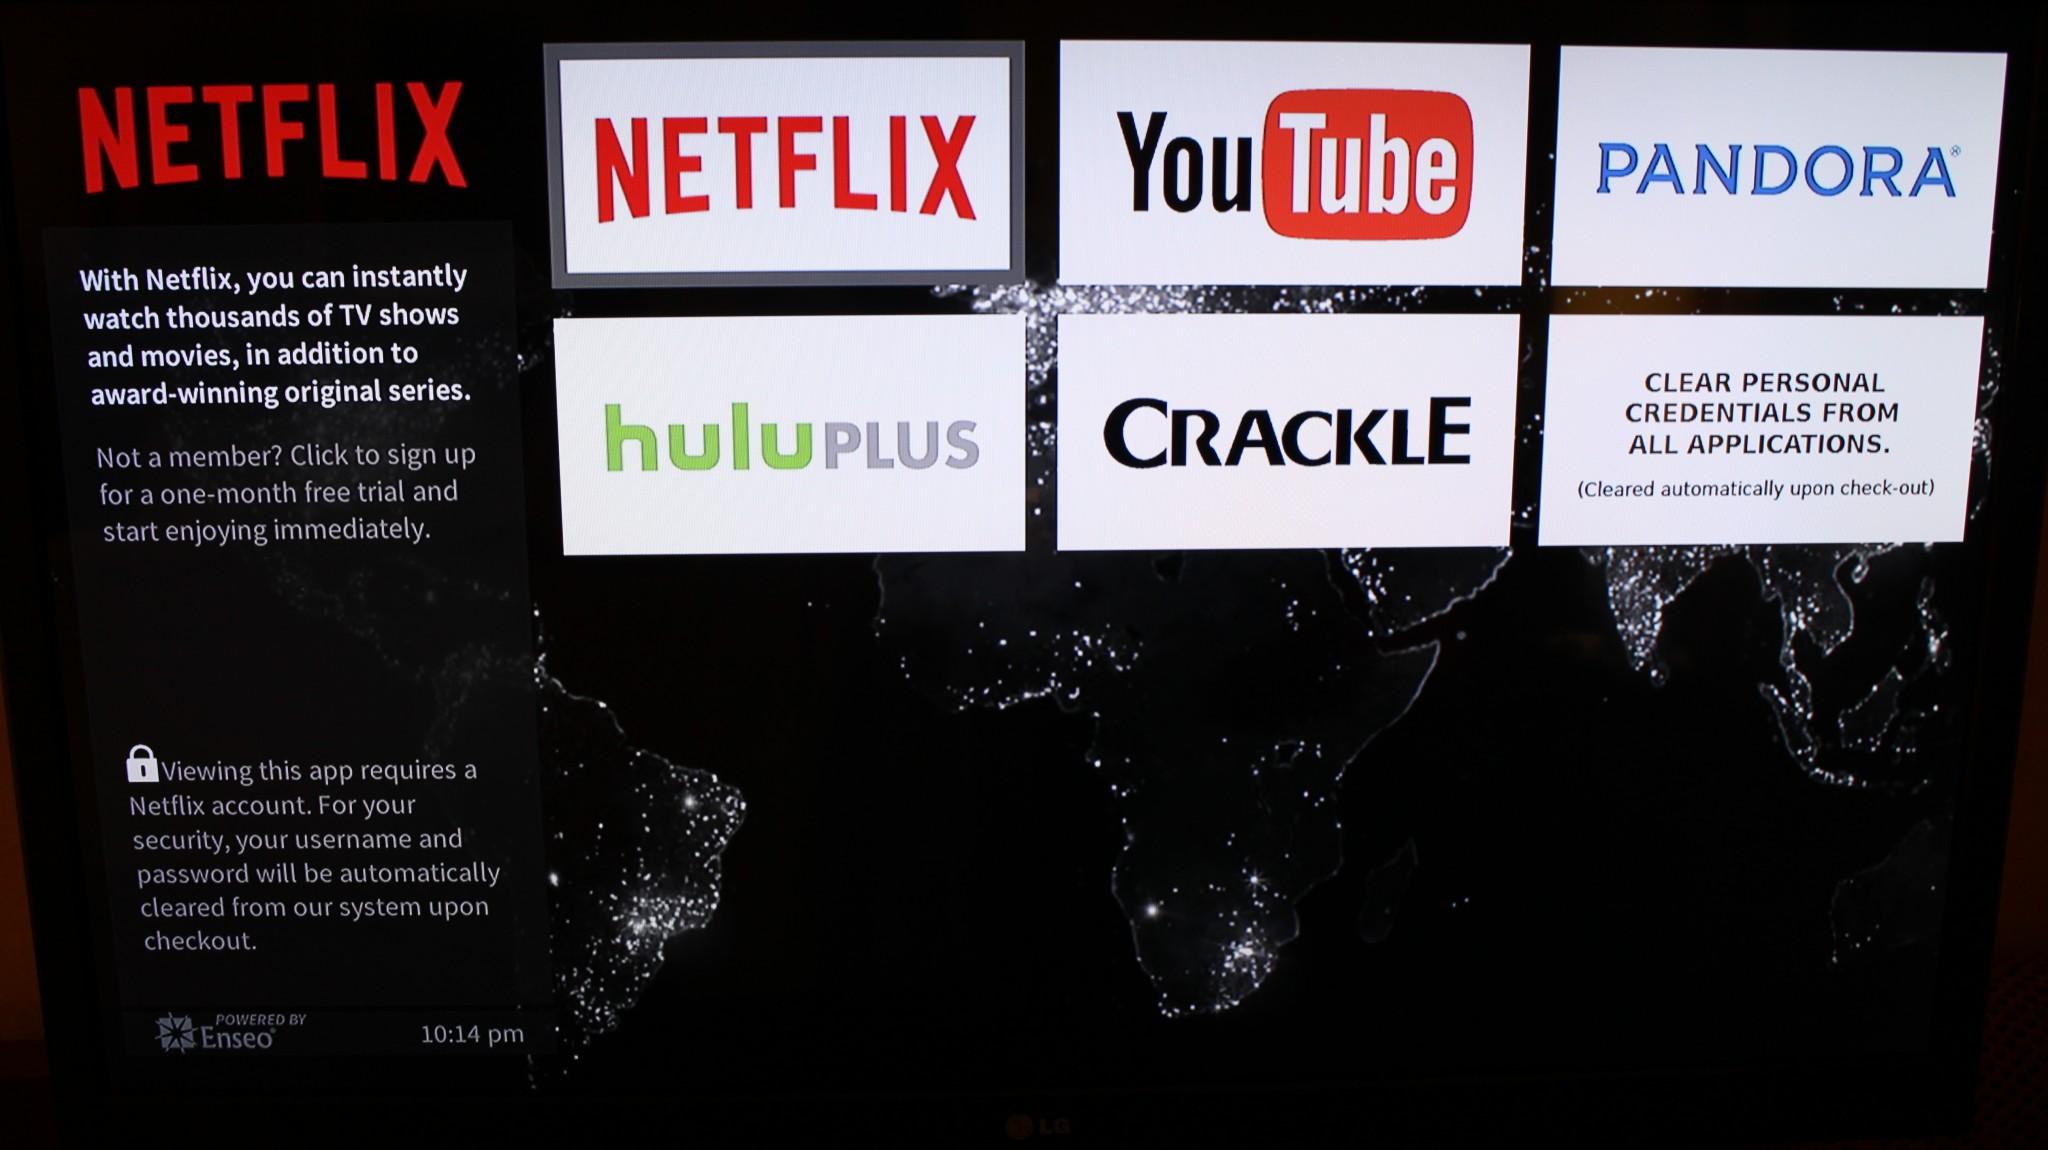 Marriott Hotels Add Netflix, Hulu Plus, Crackle, and YouTube